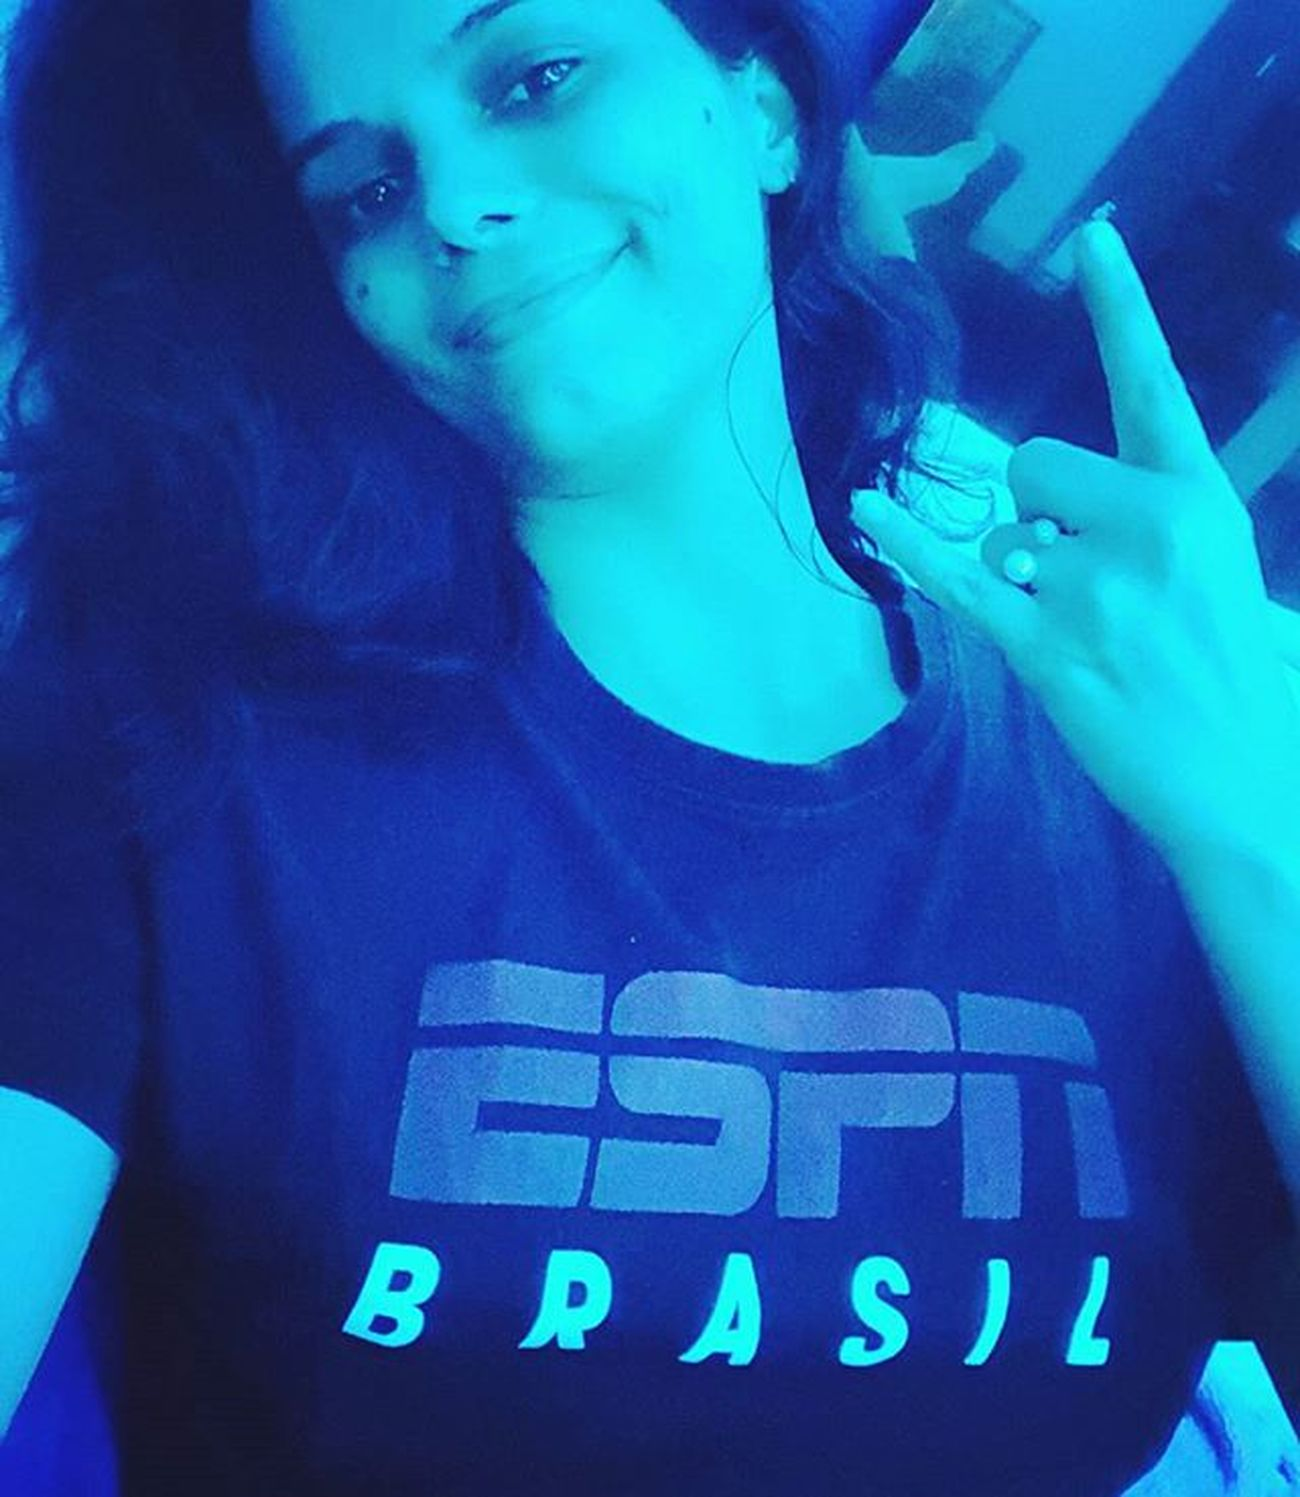 Can't wait to @nbatv started! 🏀🔝 ESPN ESPNBRASIL 😘🏀👌